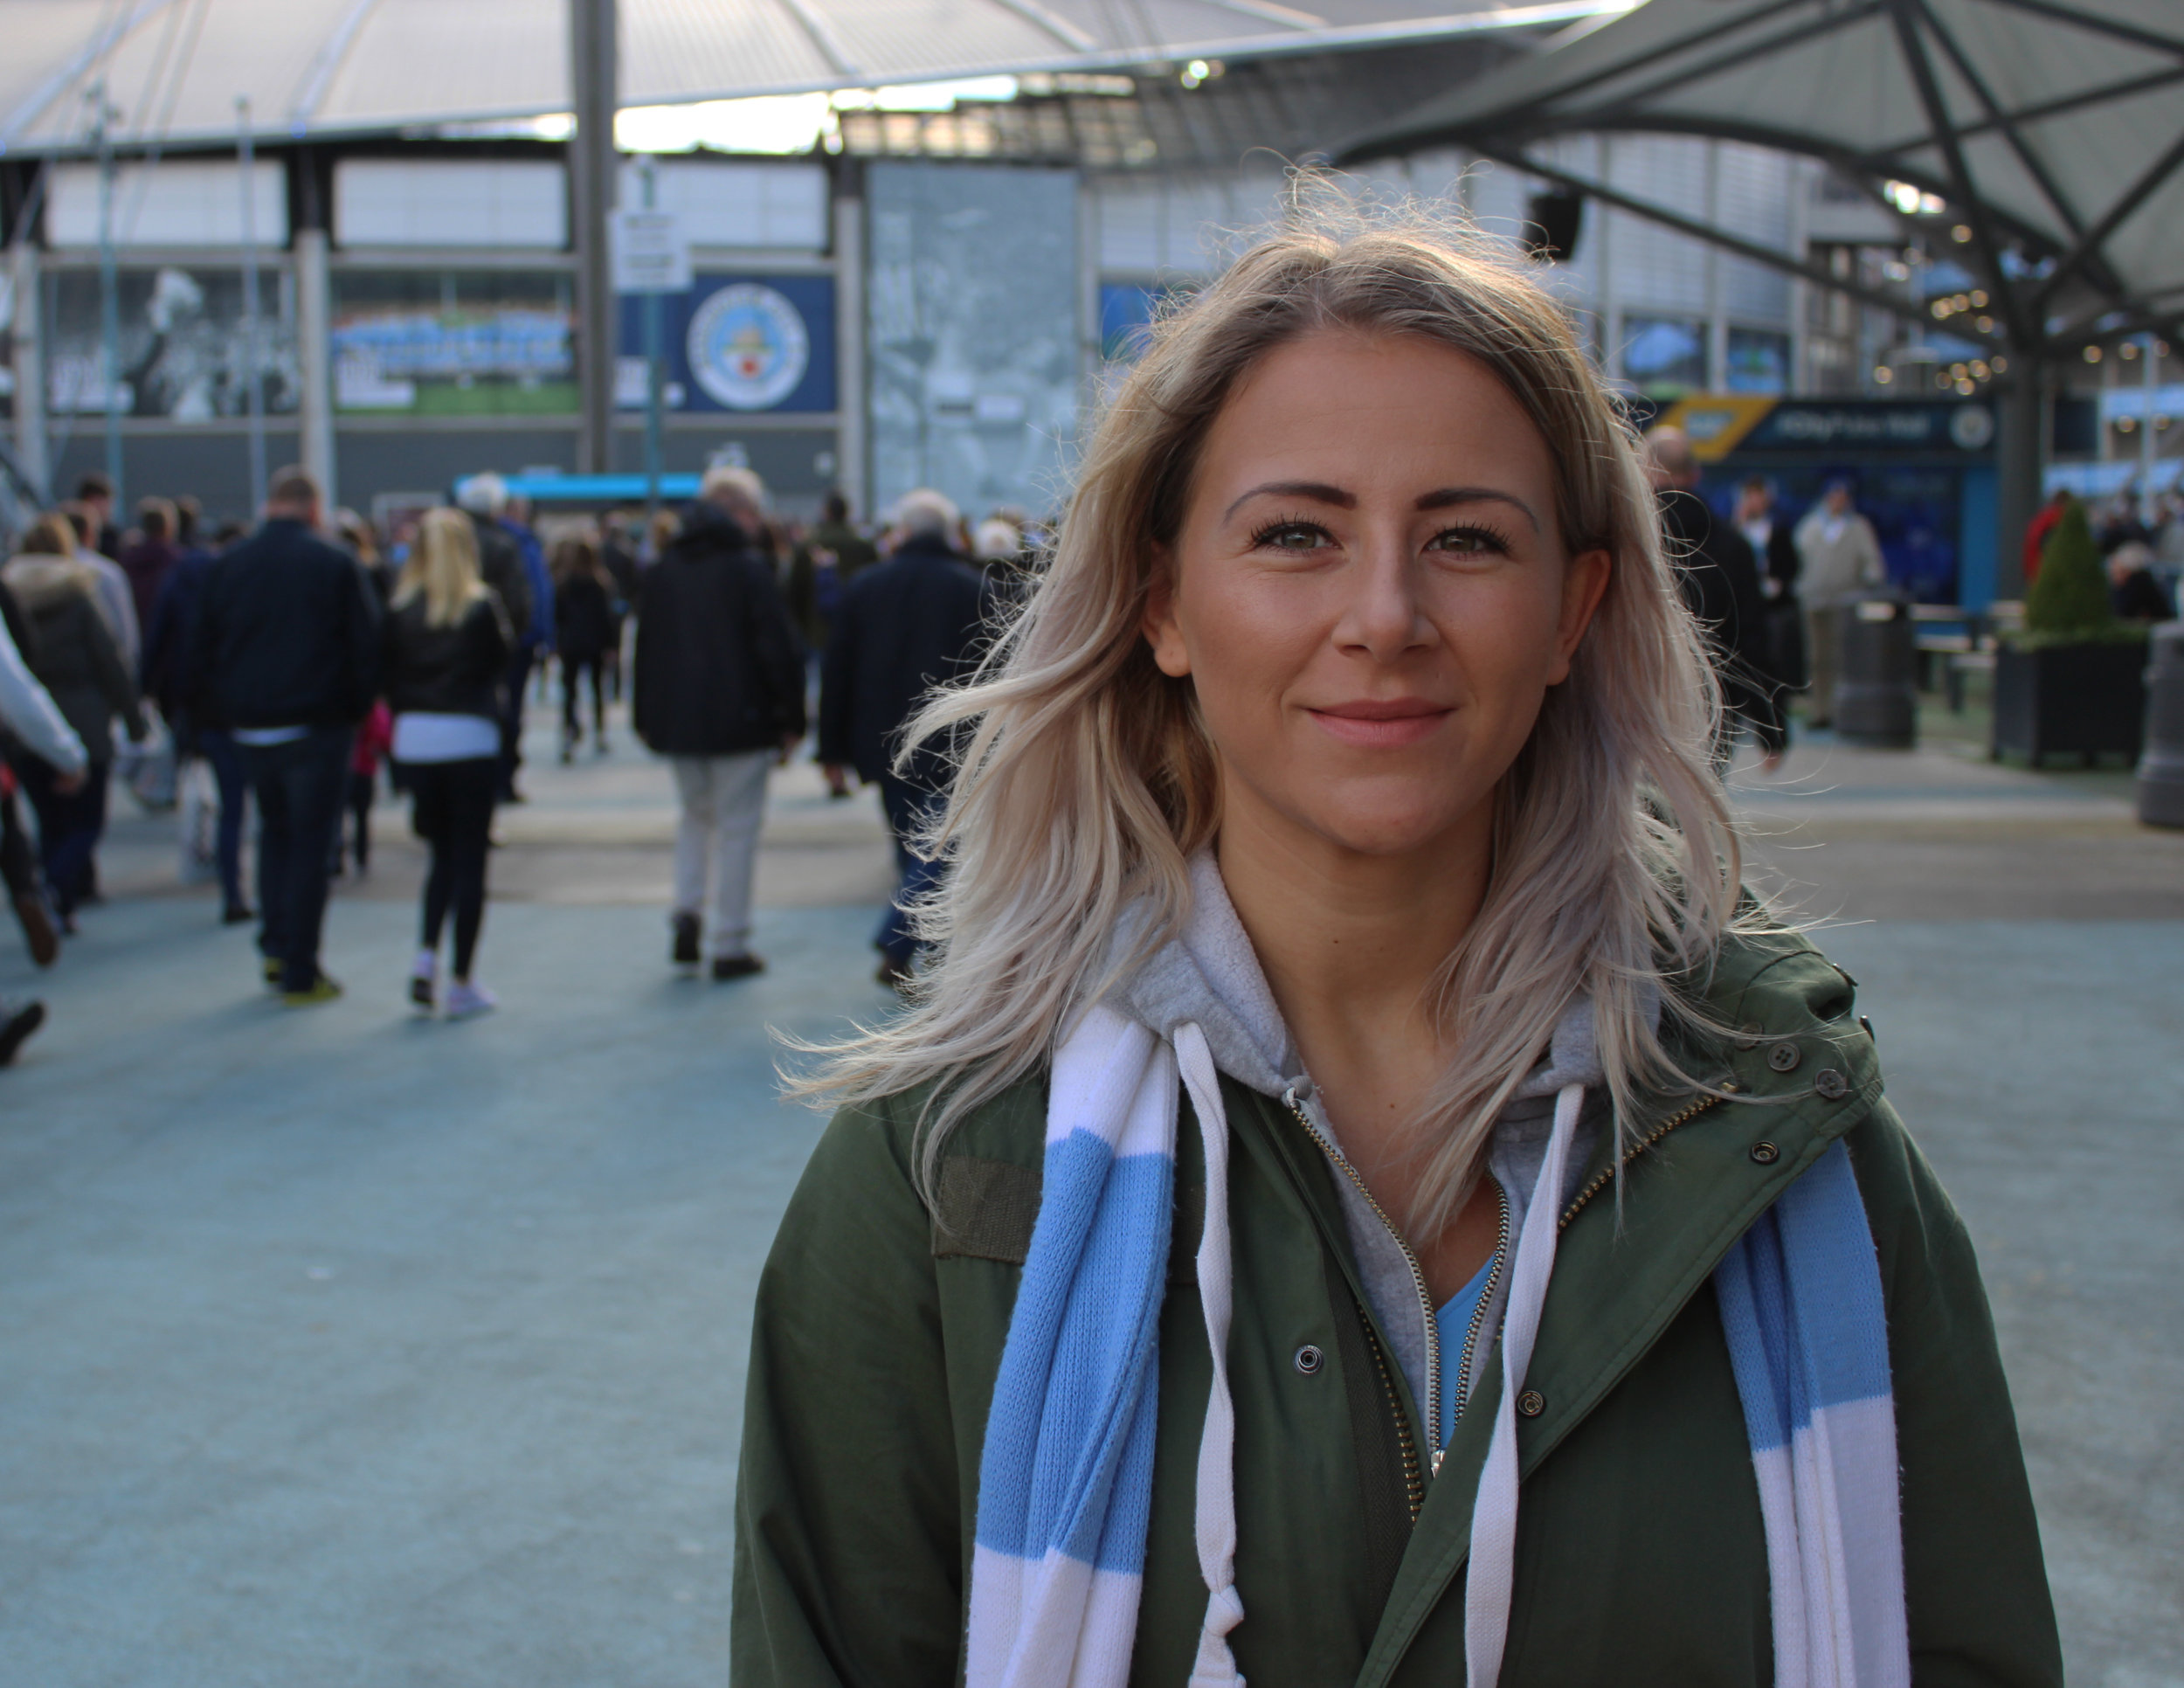 Manchester City Female Football Fan - This Fan Girl